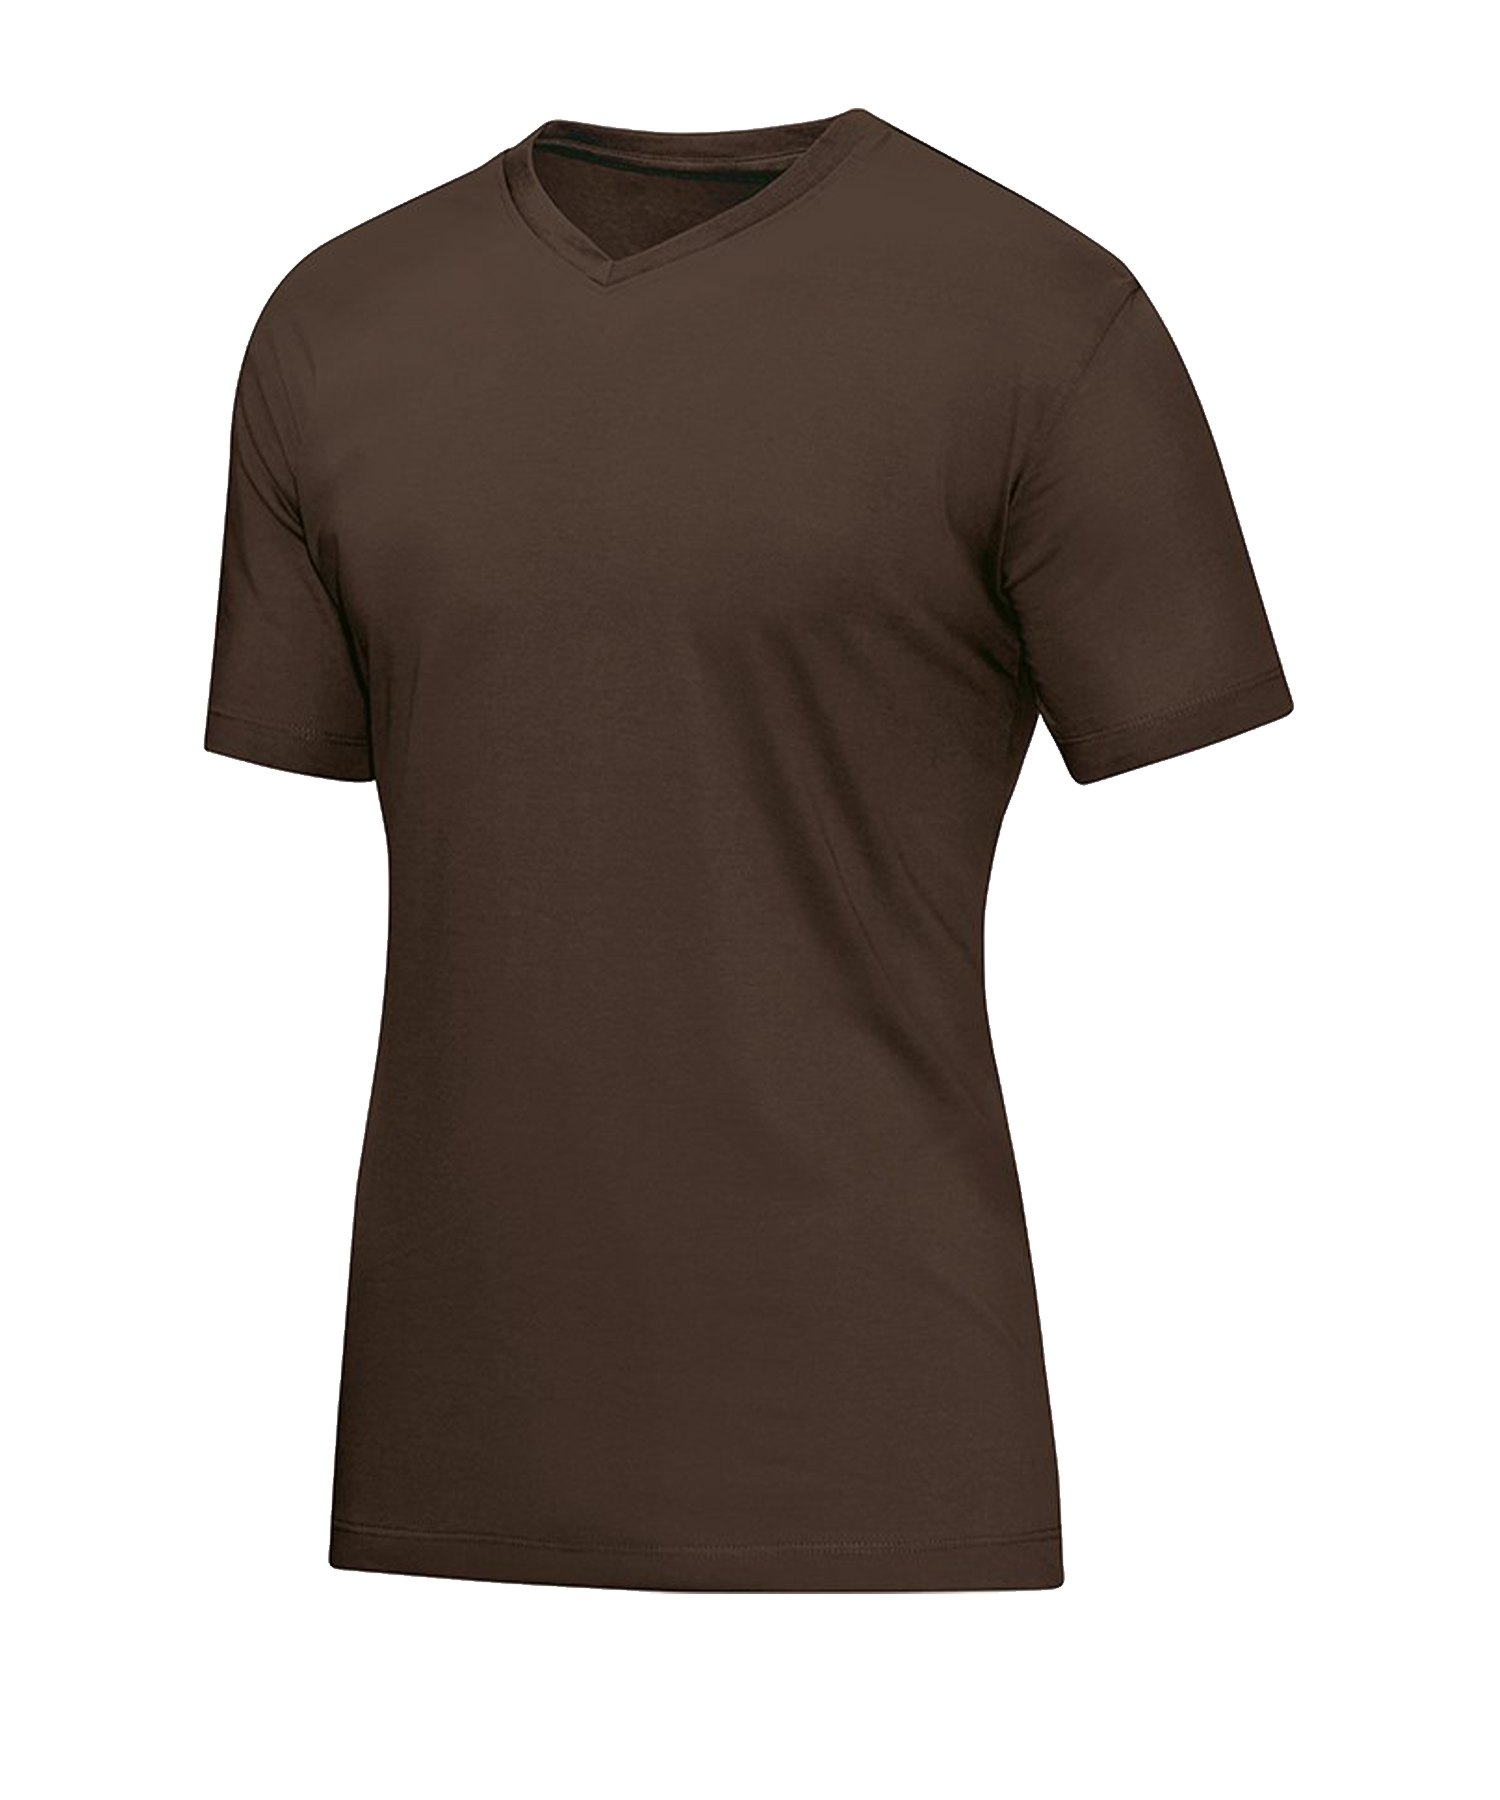 Jako V-Neck T-Shirt Braun F37 - braun